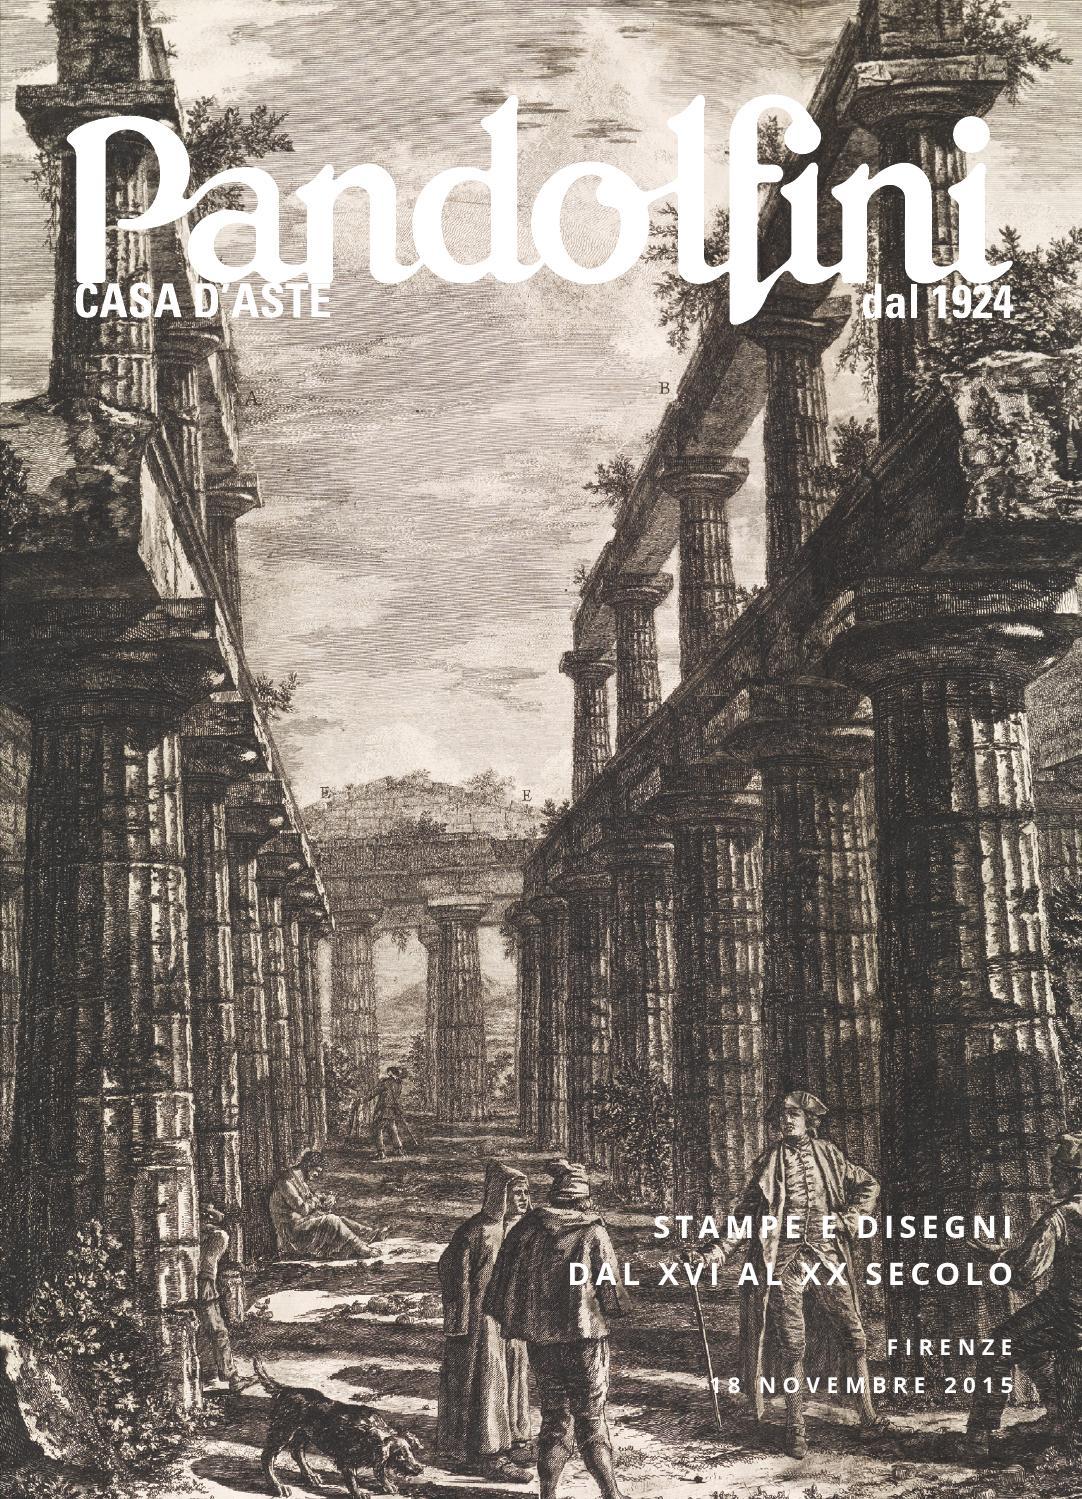 Importanti dipinti antichi by pandolfini casa d'aste   issuu